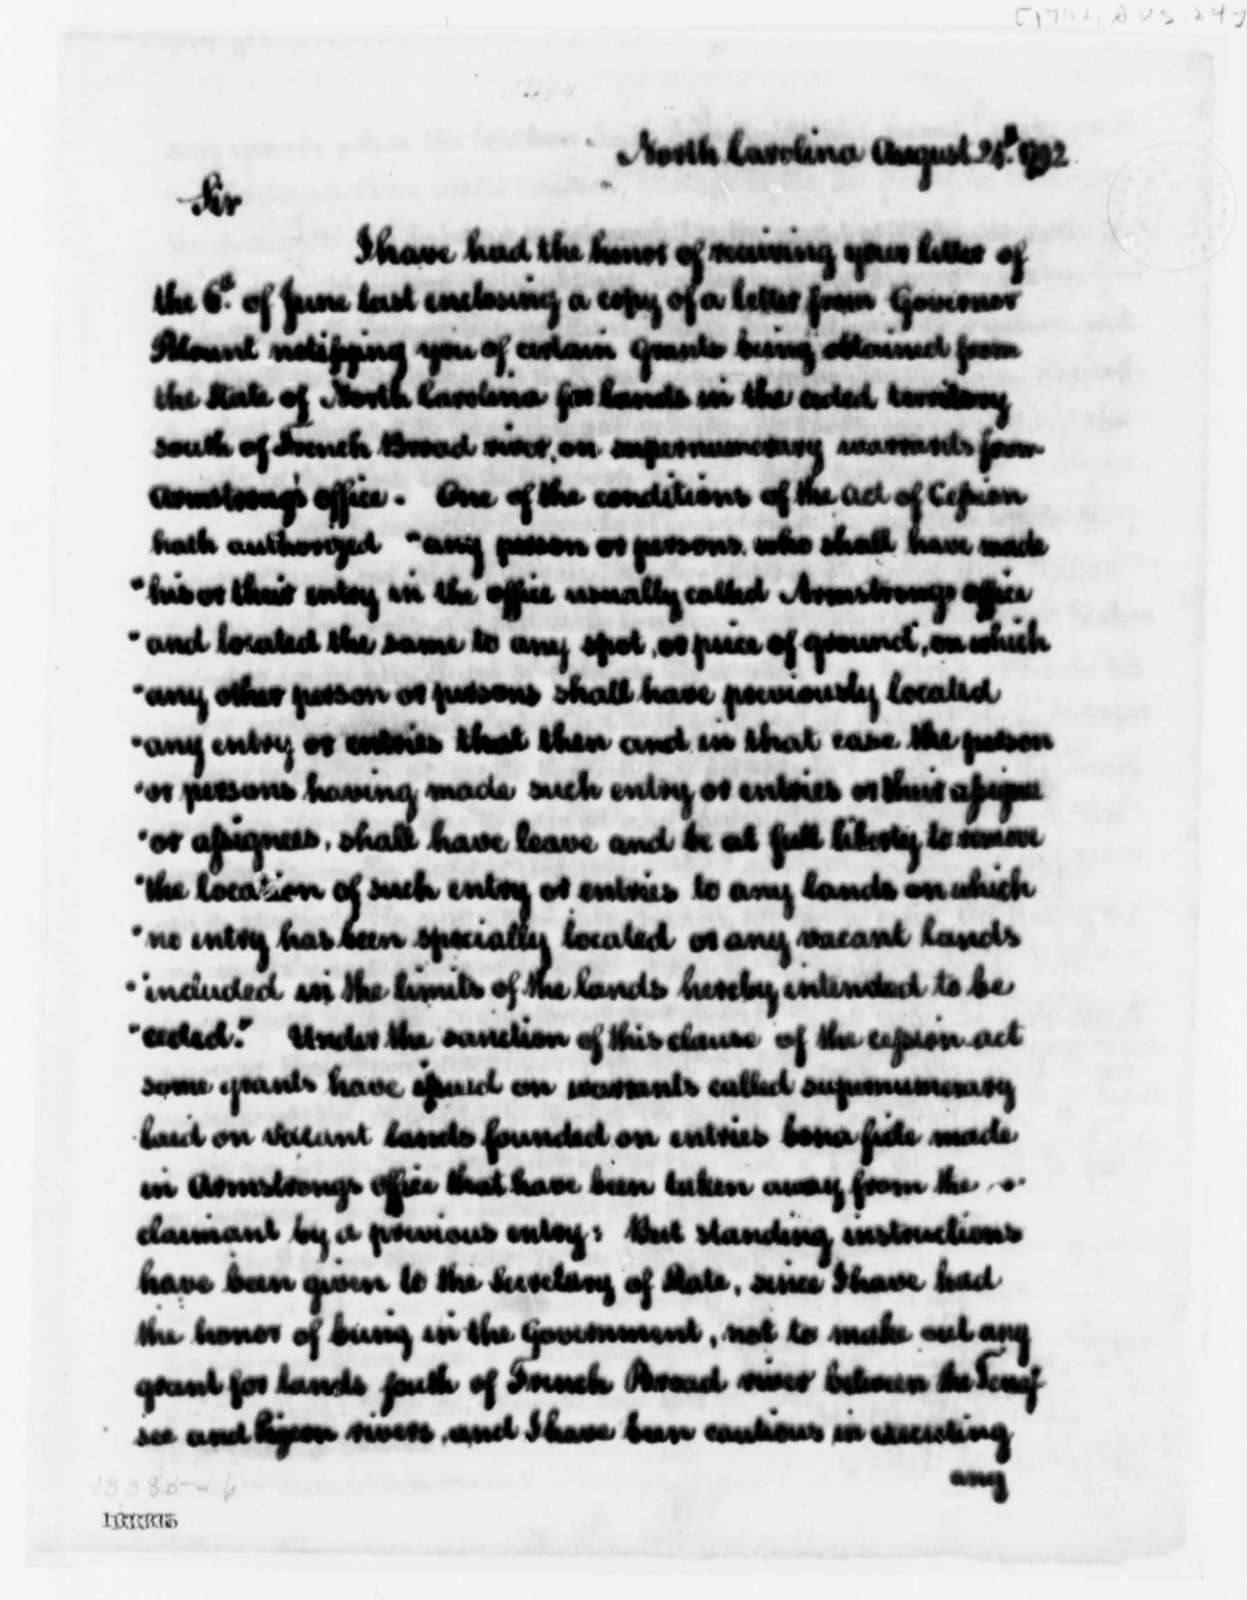 Alexander Martin to Thomas Jefferson, August 24, 1792